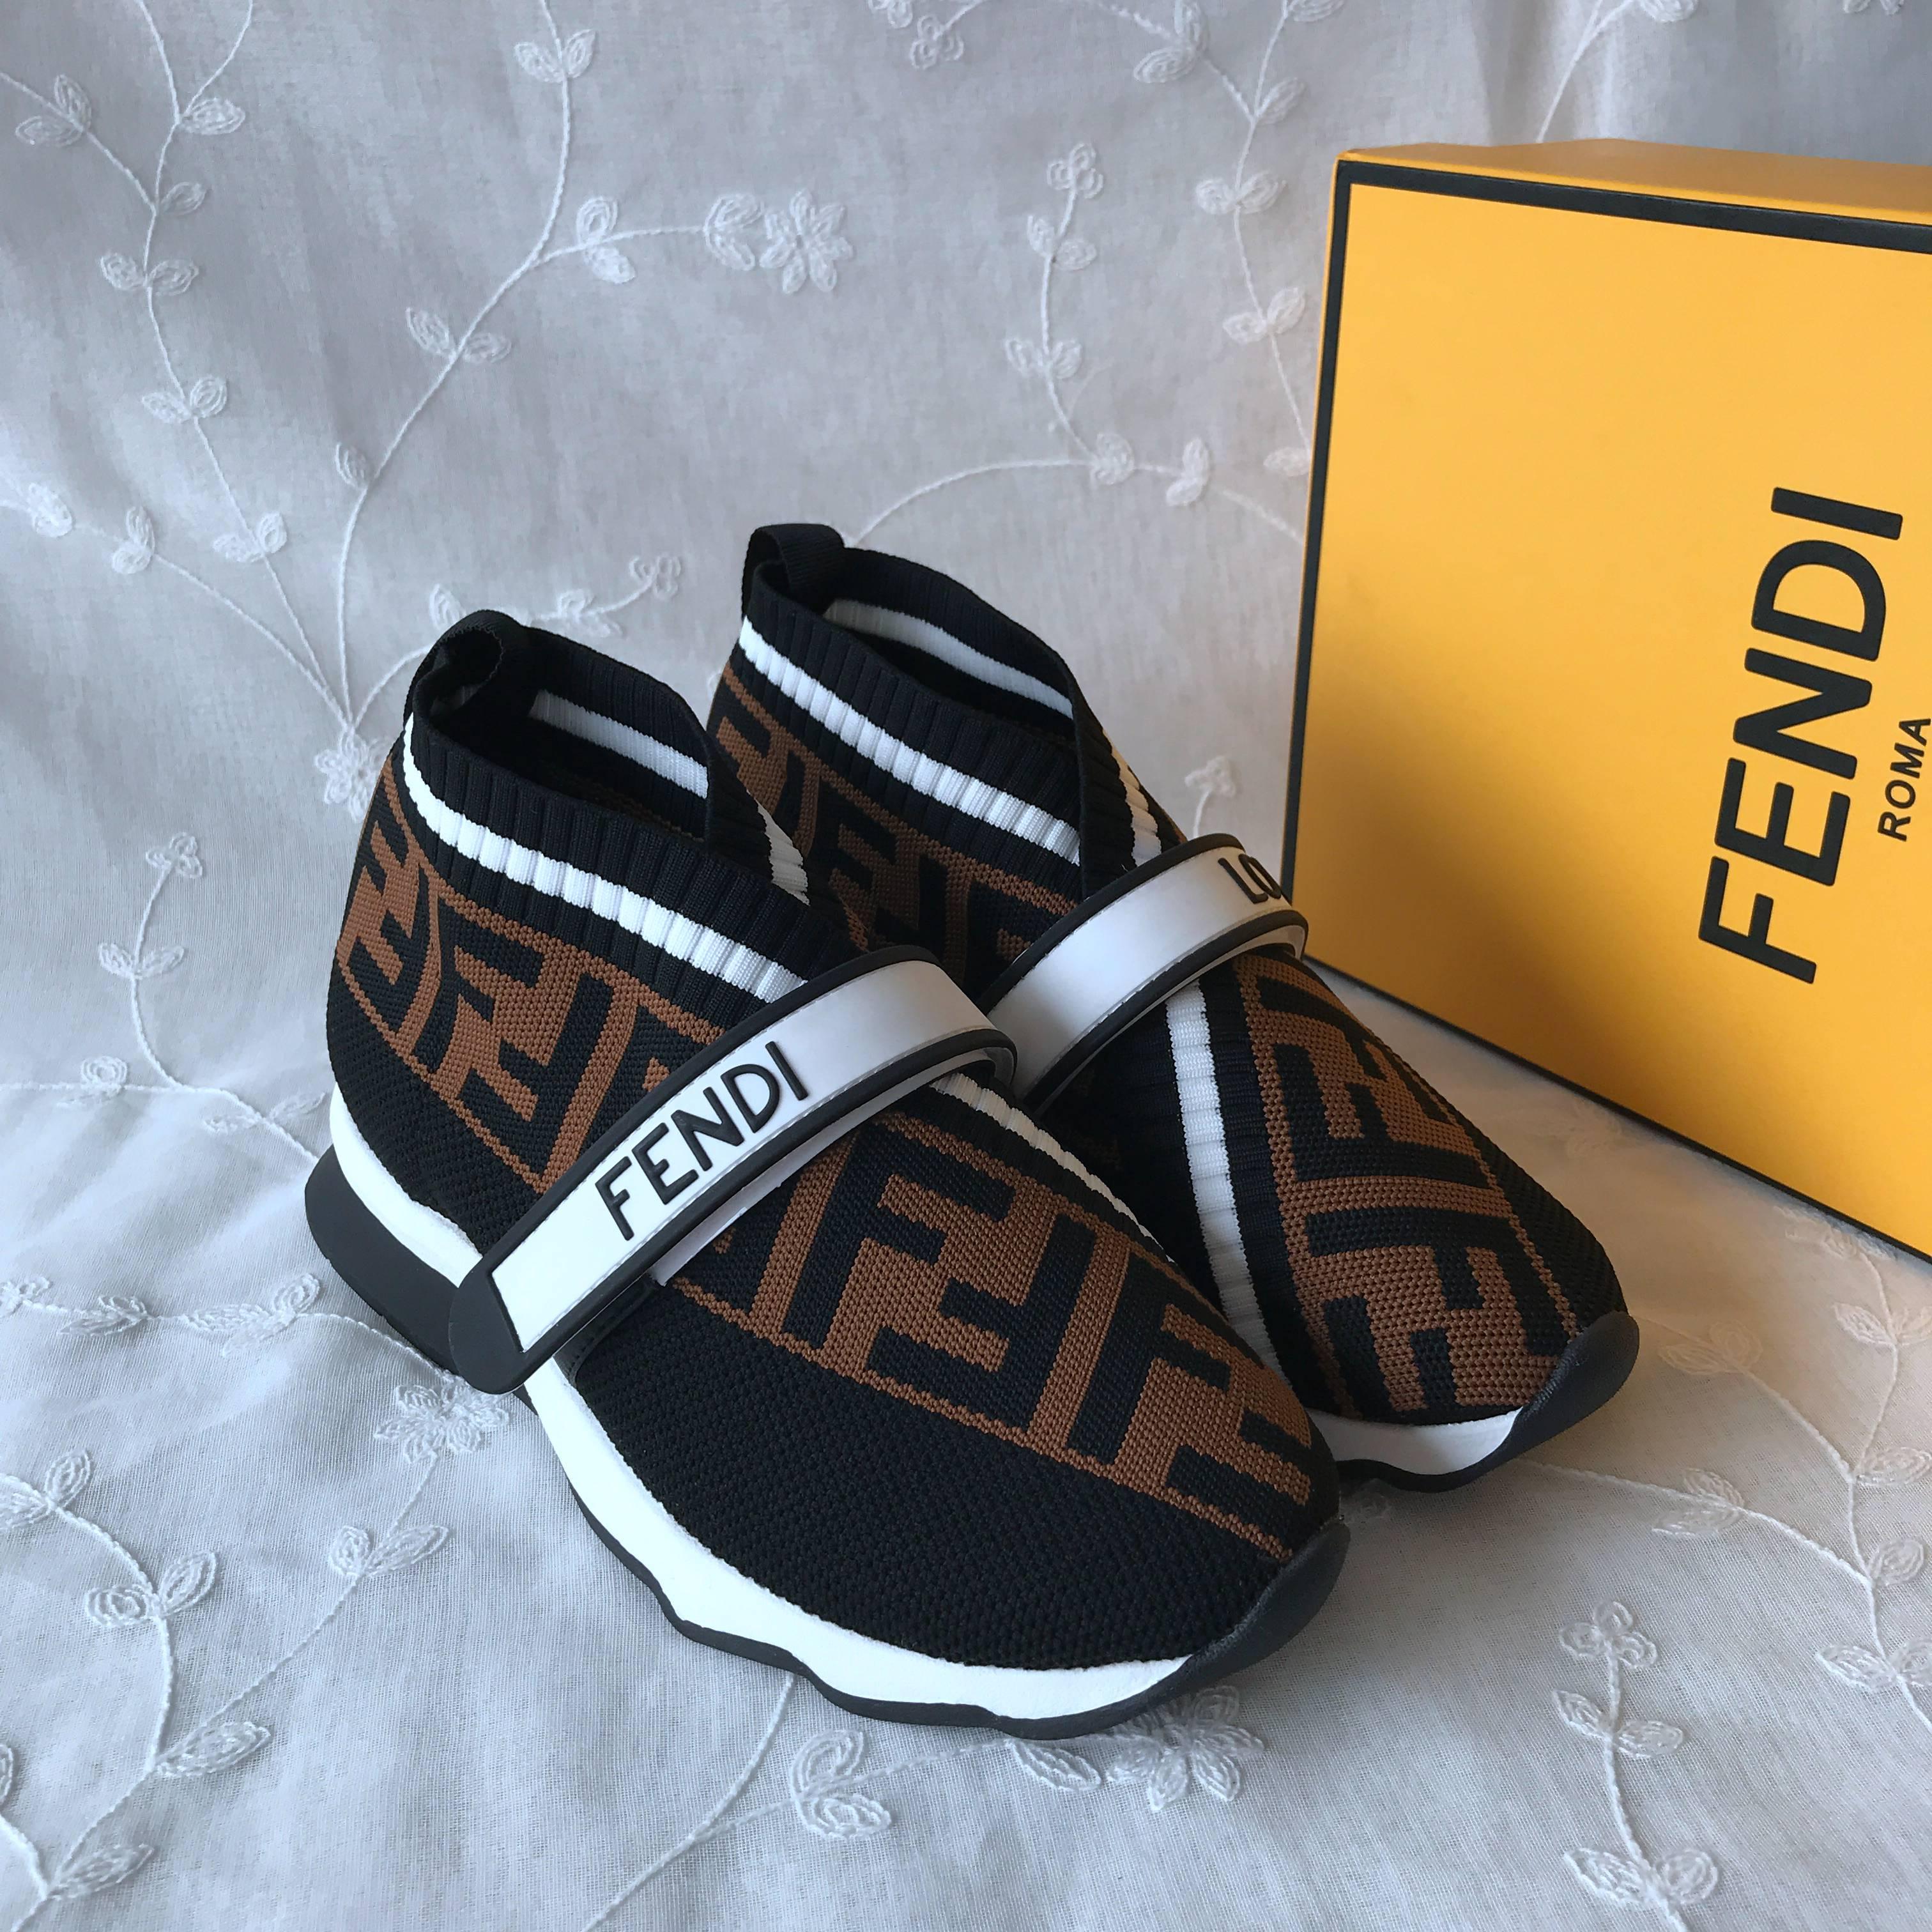 Fendi Casual Shoes 832520